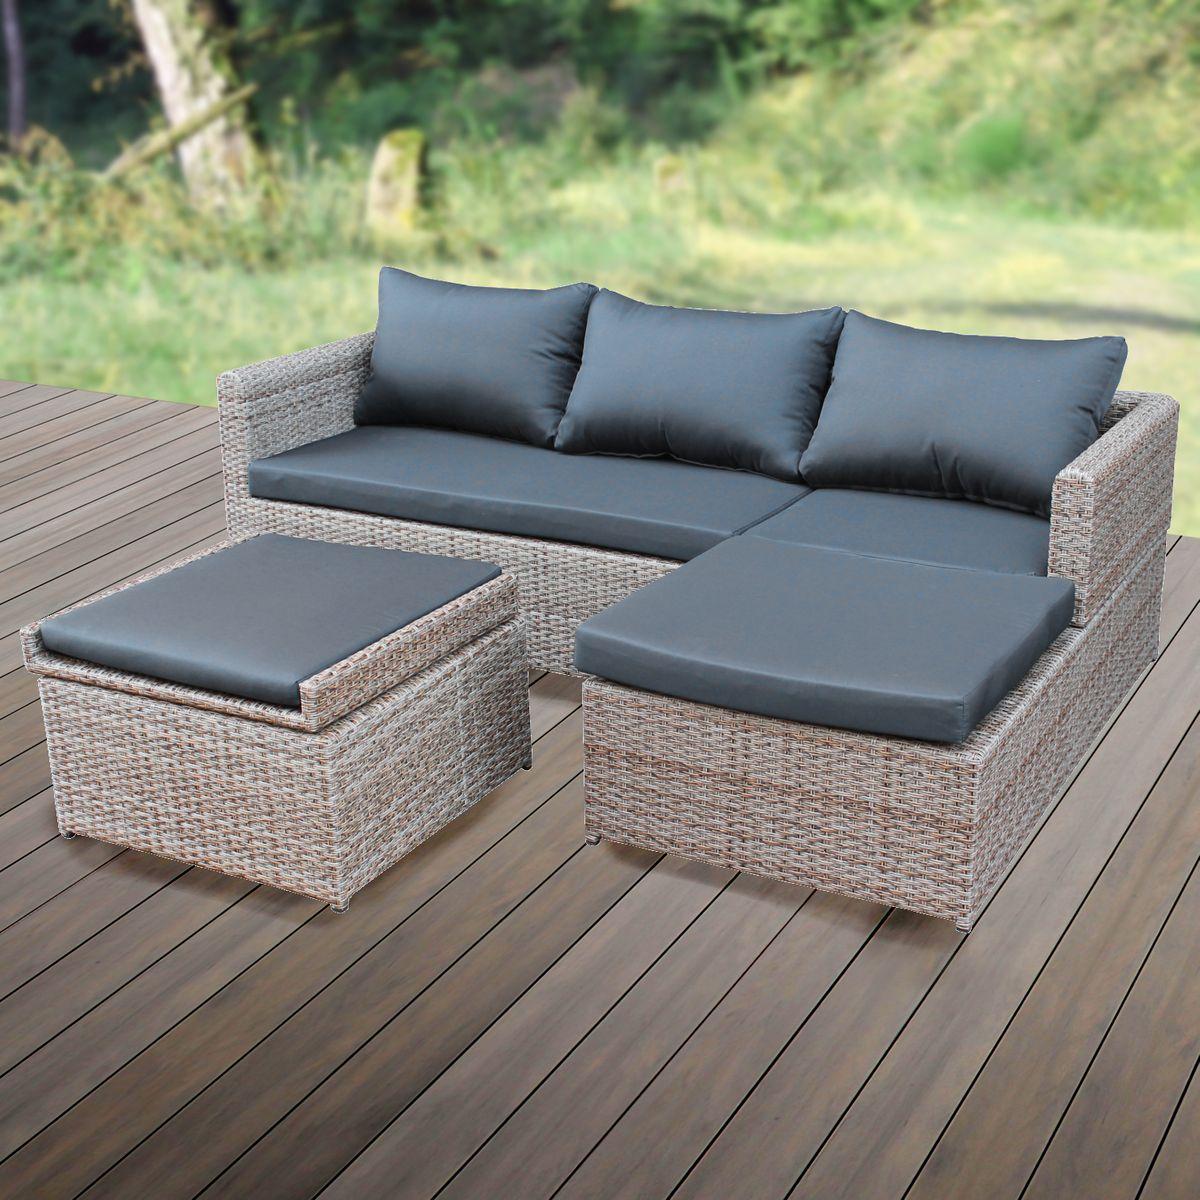 Schickes Wohndesign Gartenmoebel Rattan Lounge